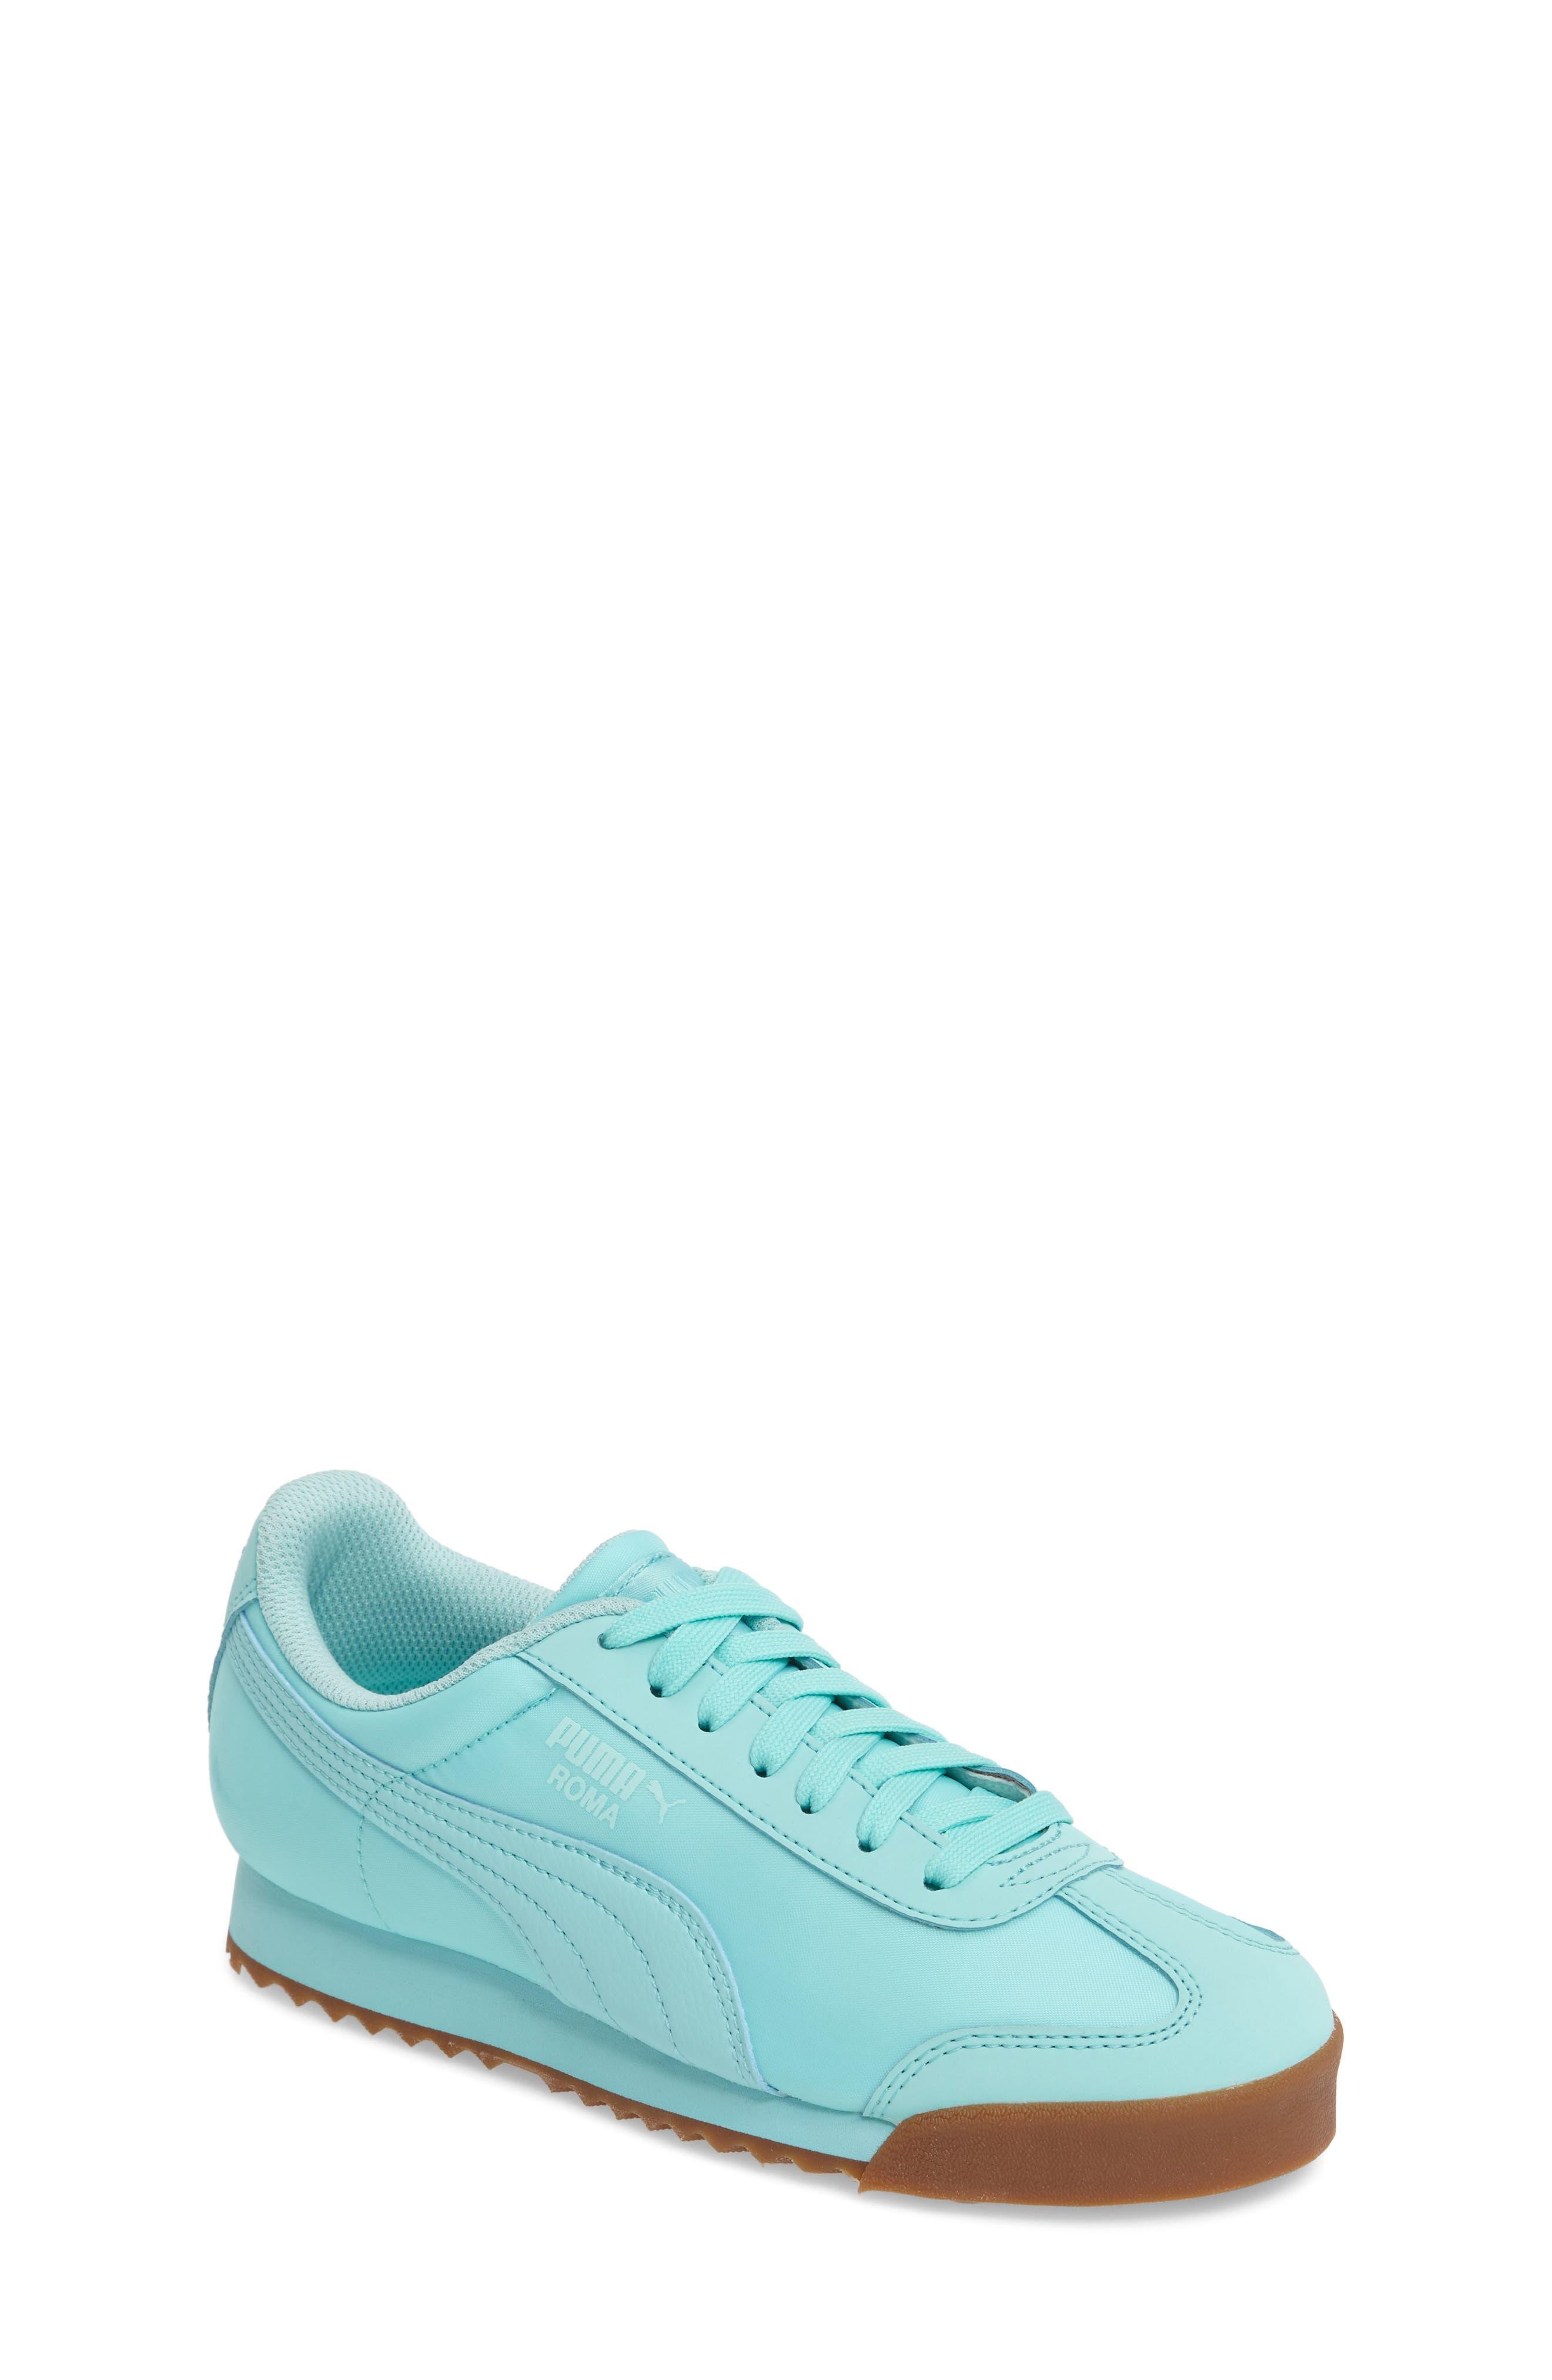 Roma Basic Summer Sneaker,                         Main,                         color, 400